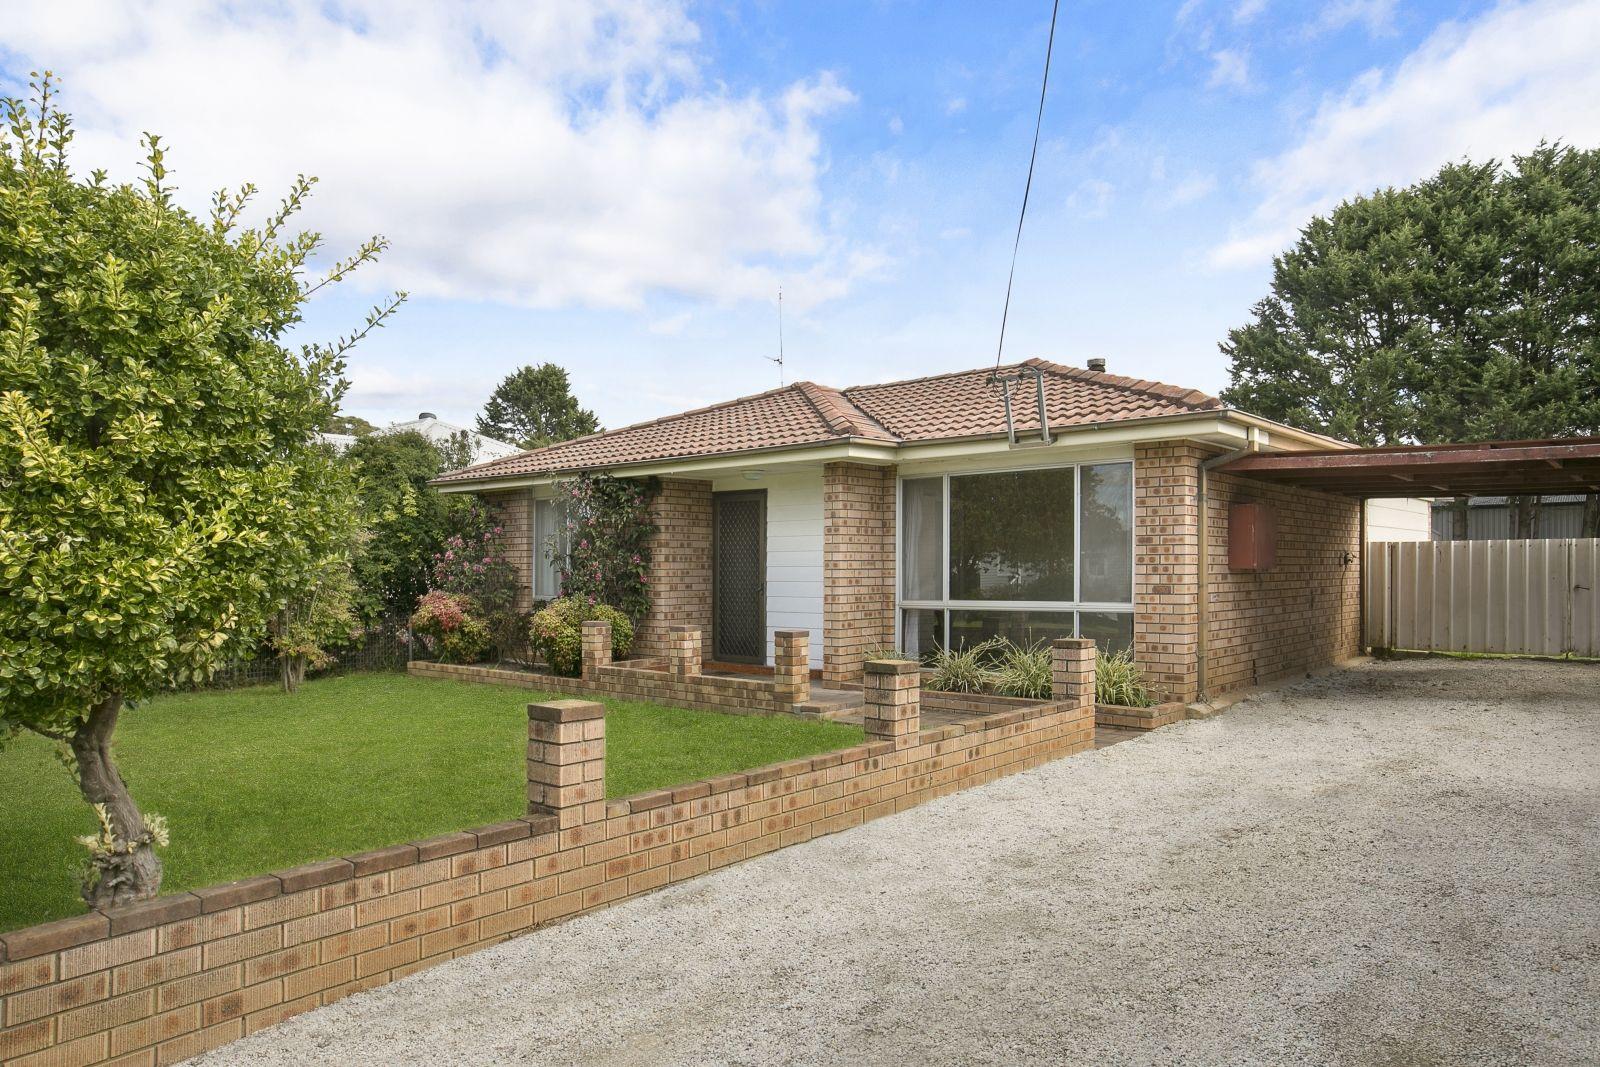 44 Melbourne Street, New Berrima NSW 2577, Image 0